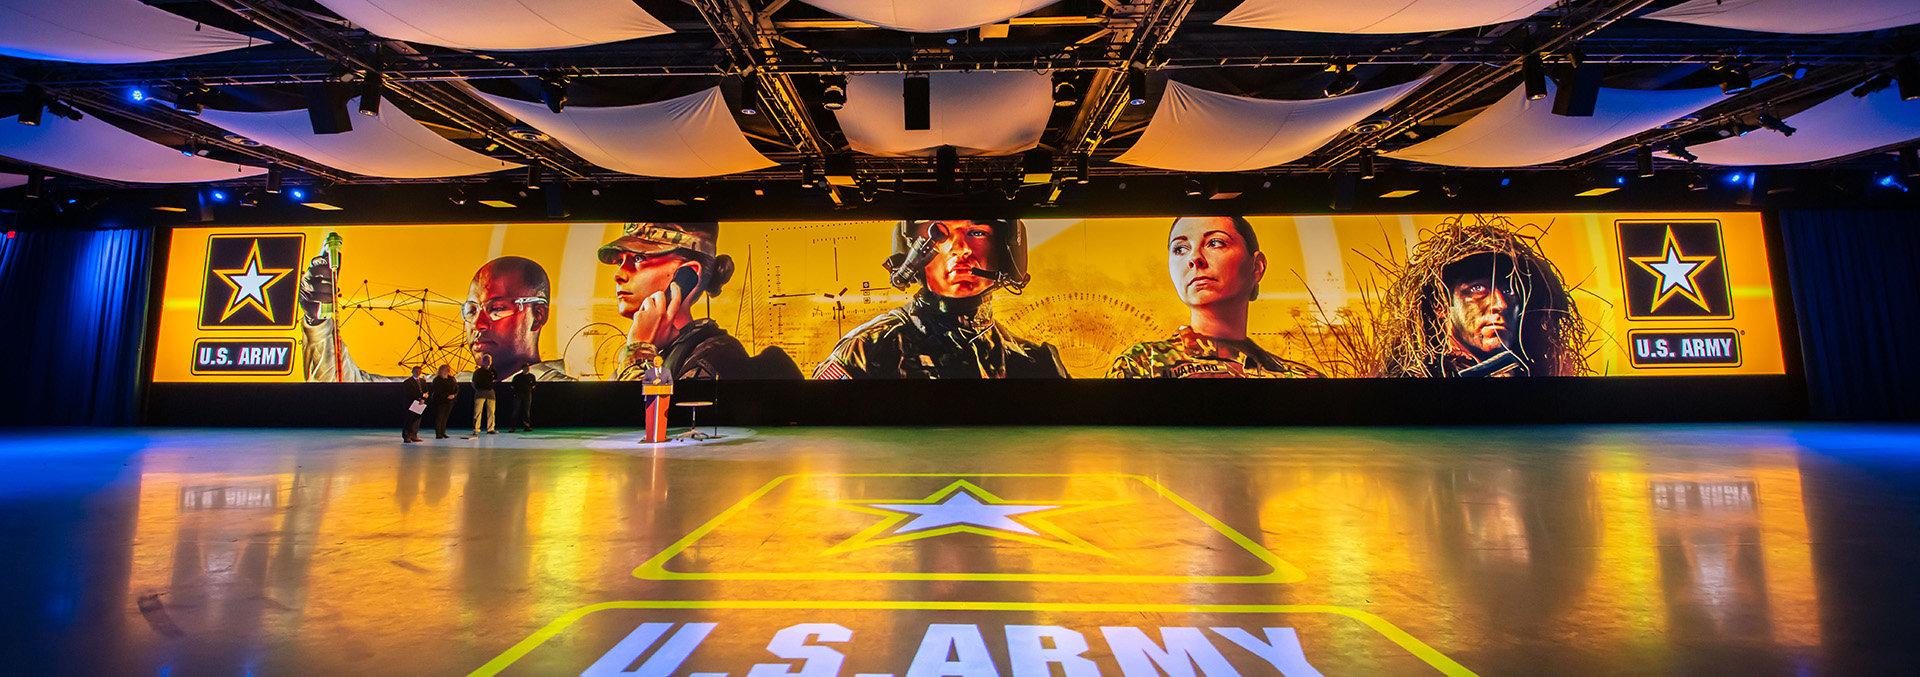 _US Army_2.jpg